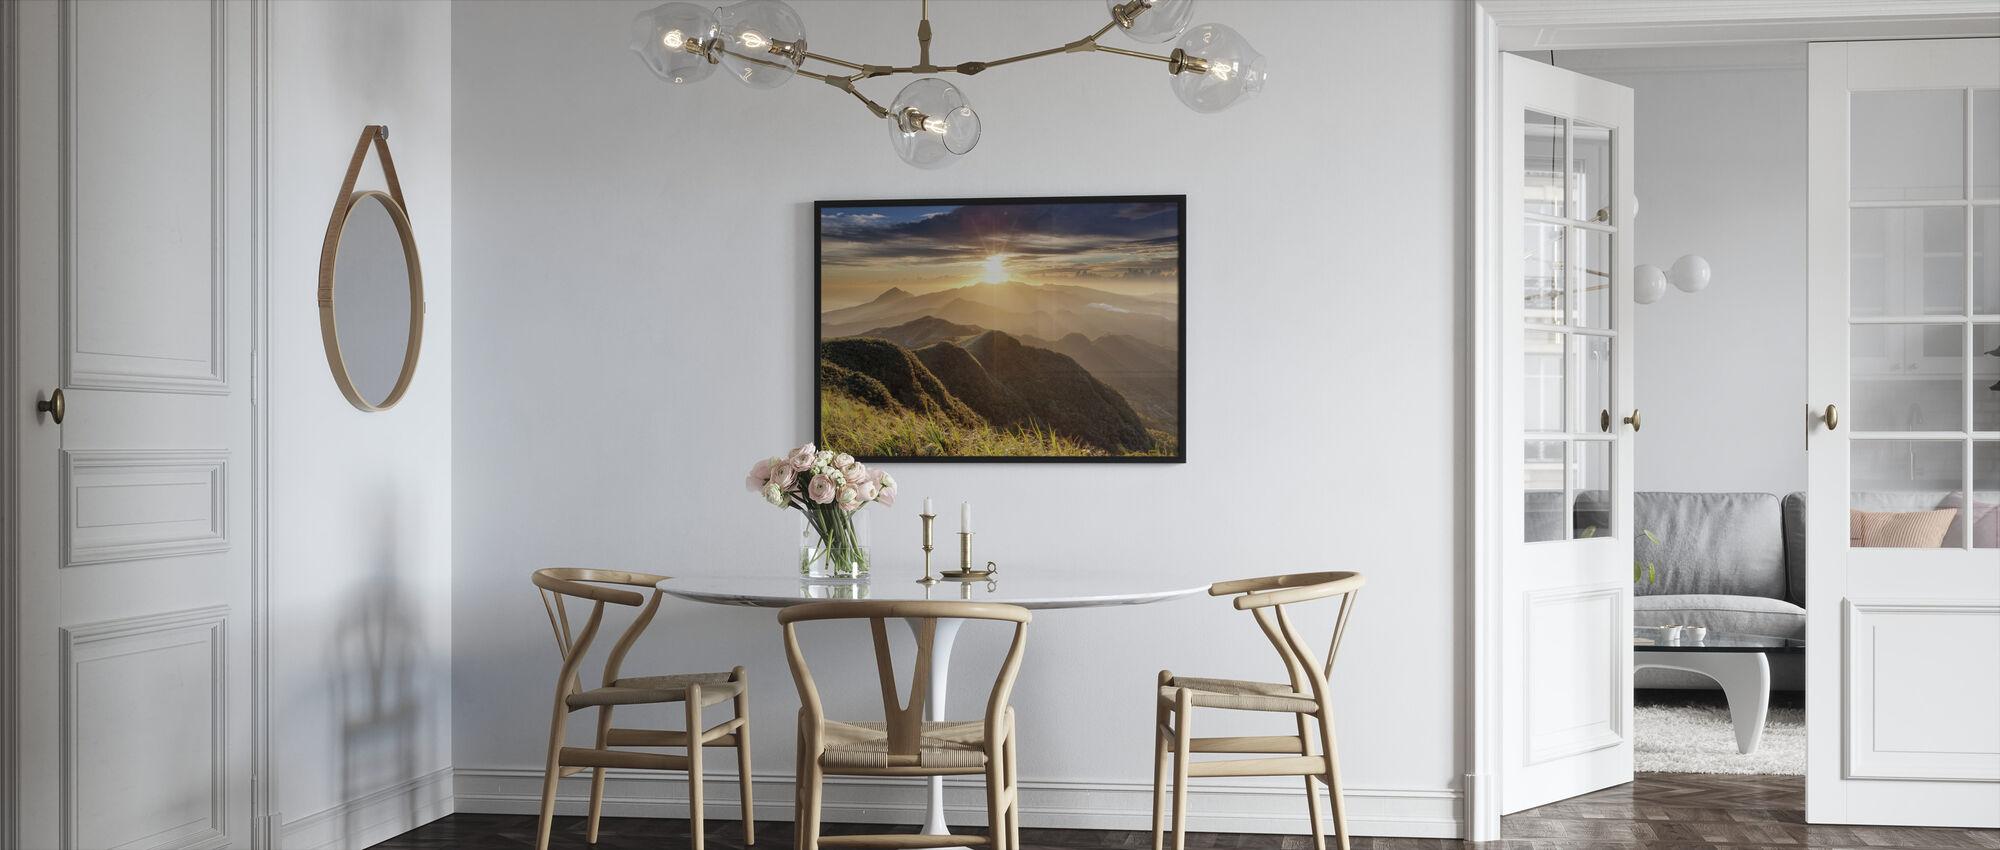 Diamonds and Rust - Framed print - Kitchen